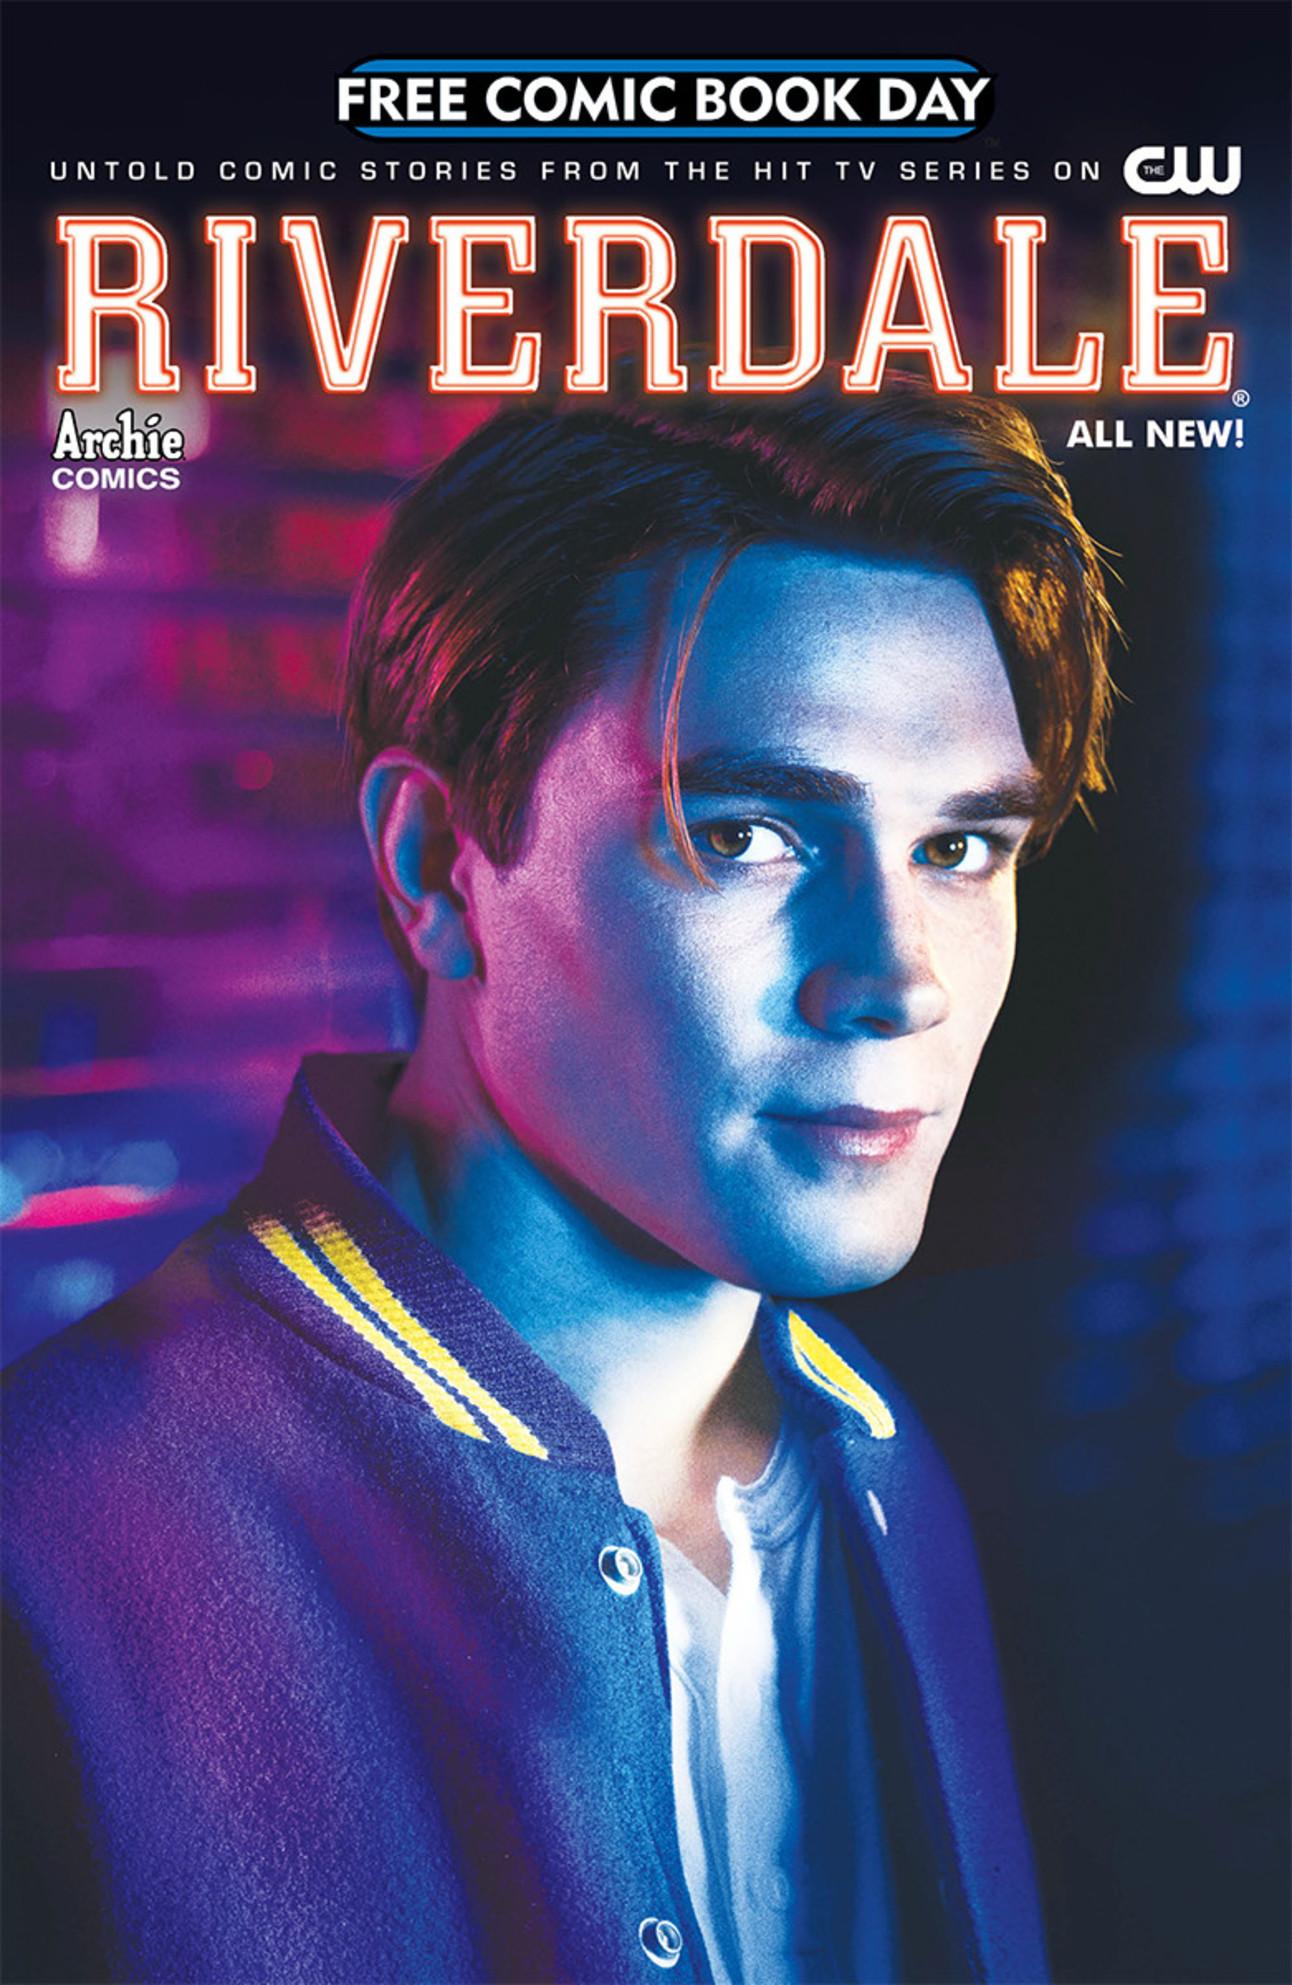 Riverdale-cover.jpeg